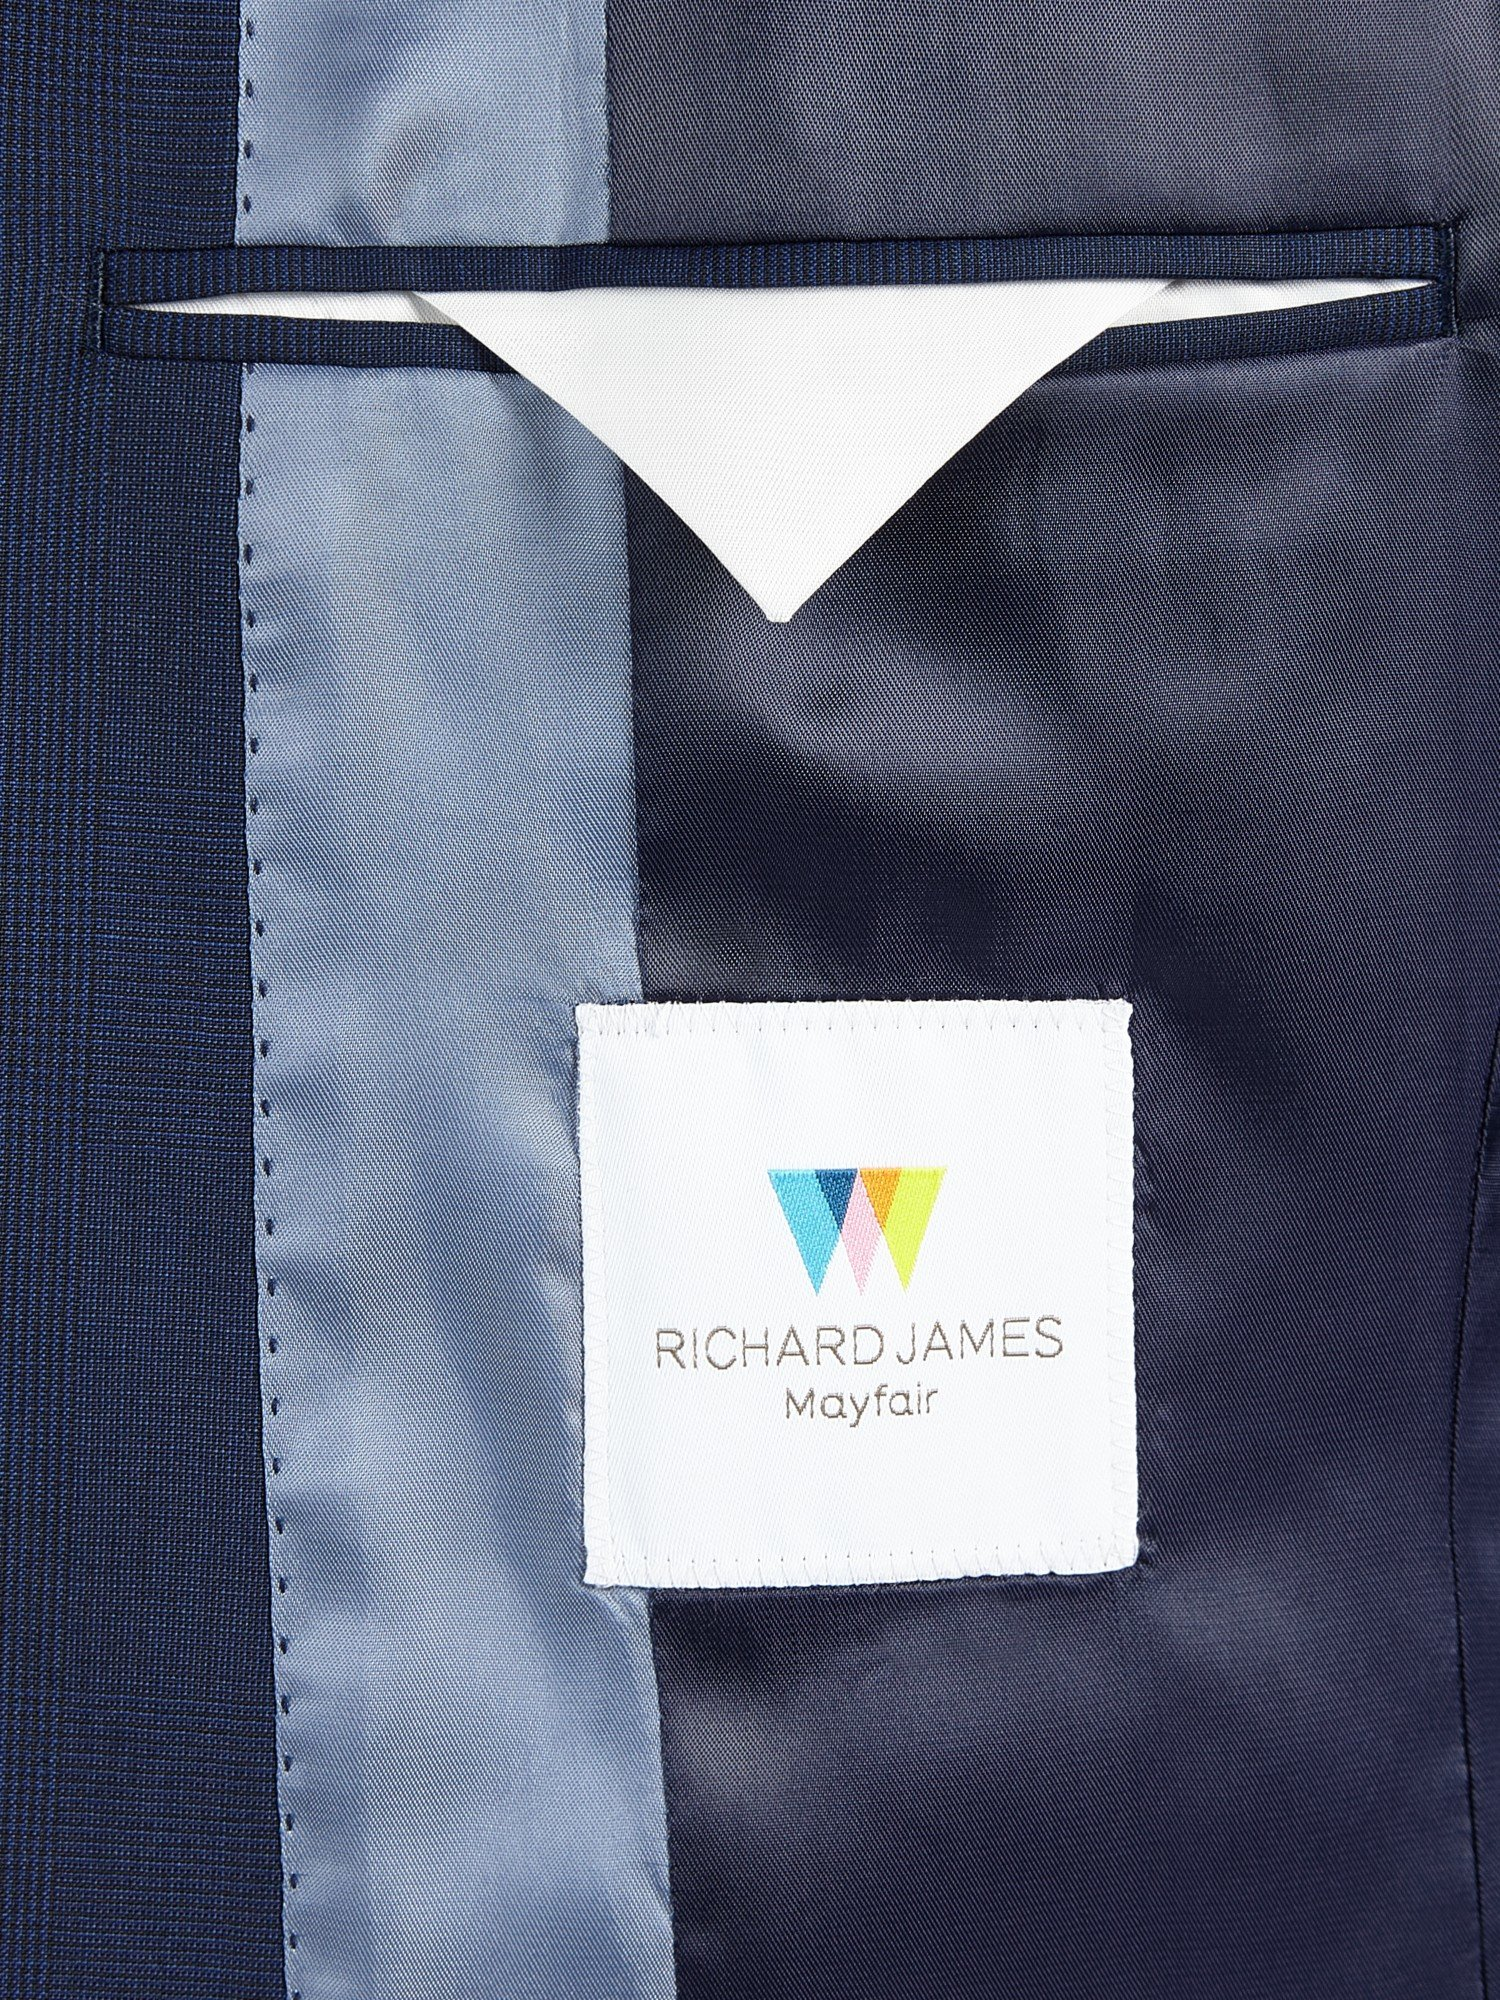 Richard James Flannel Wool Suit Jacket in Blue for Men